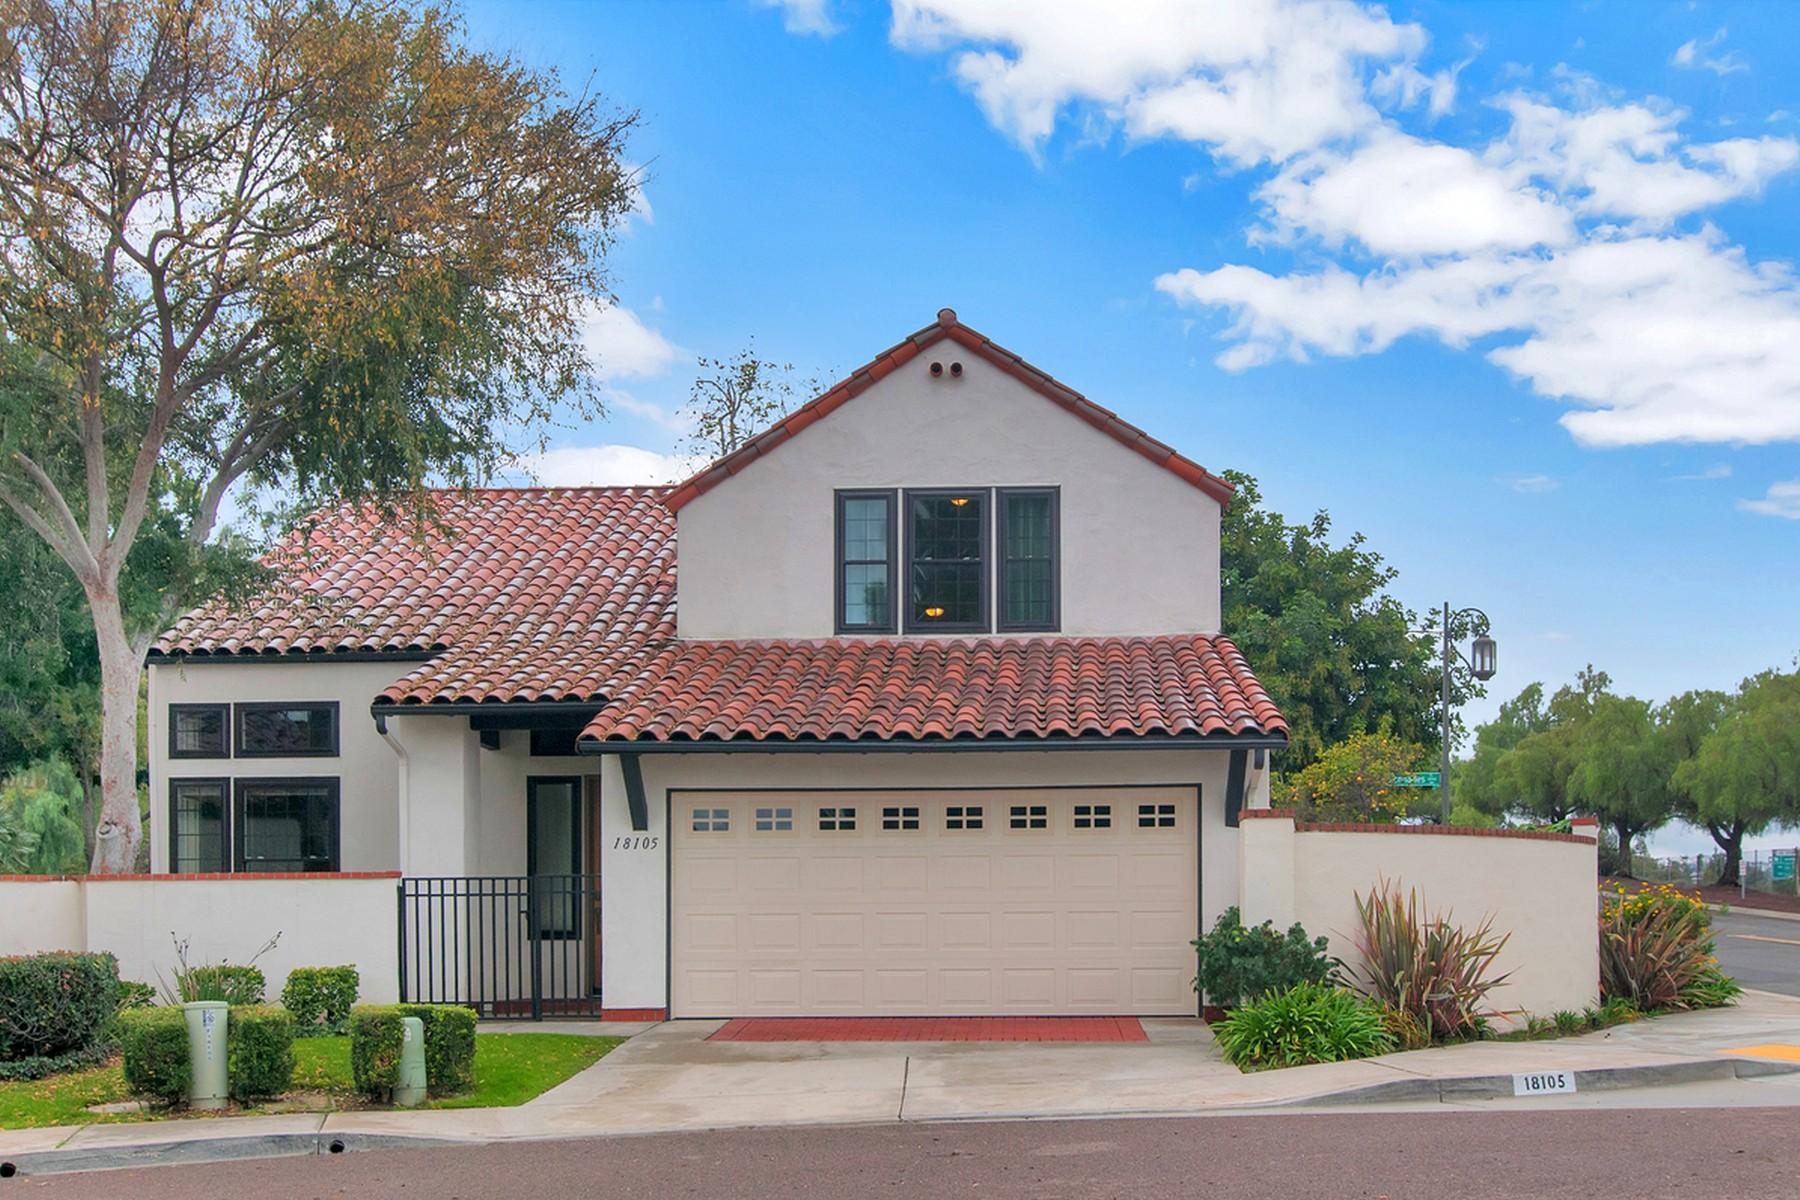 Single Family Home for Sale at 18105 Chretien Ct. Rancho Bernardo, California 92128 United States